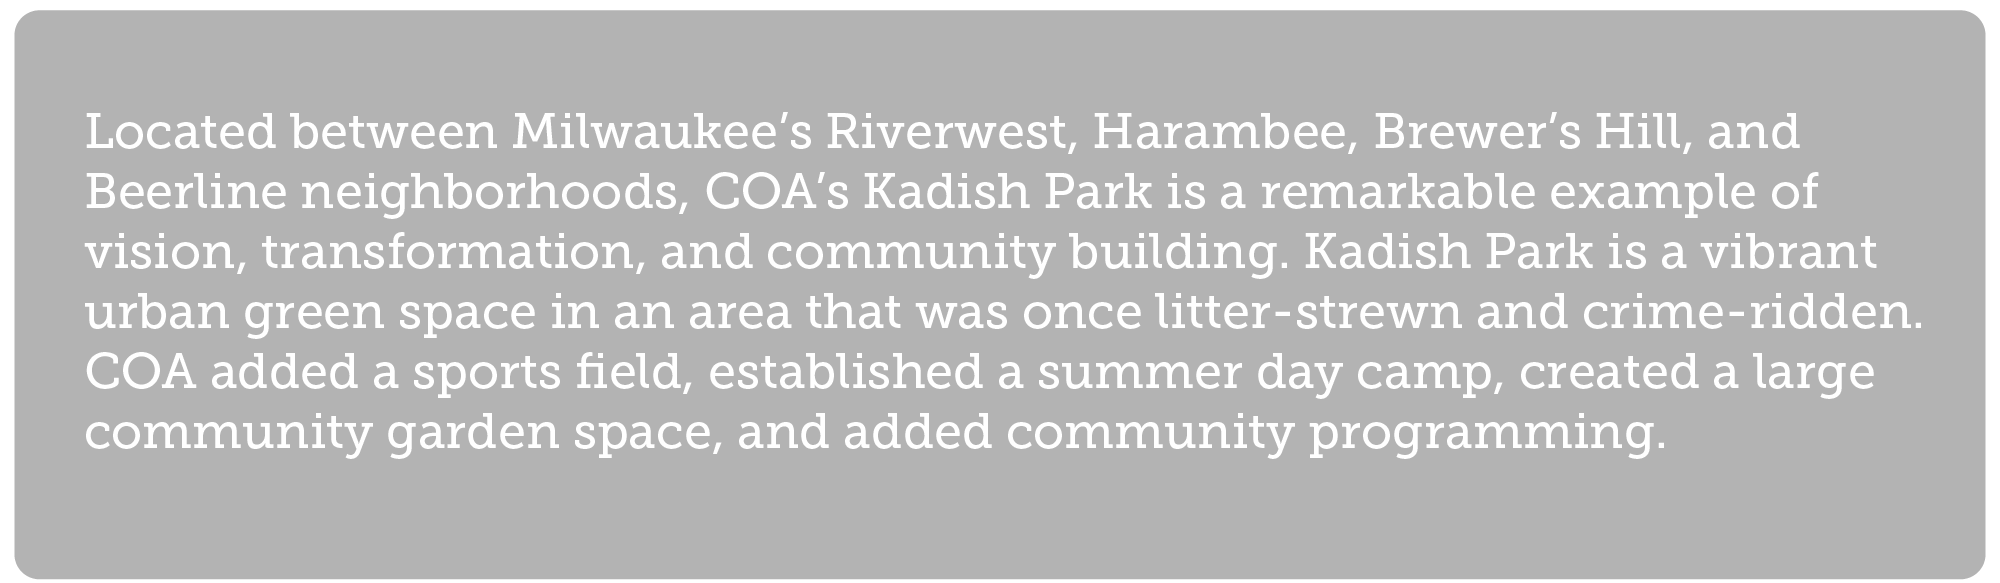 Community-Development-Parks-01